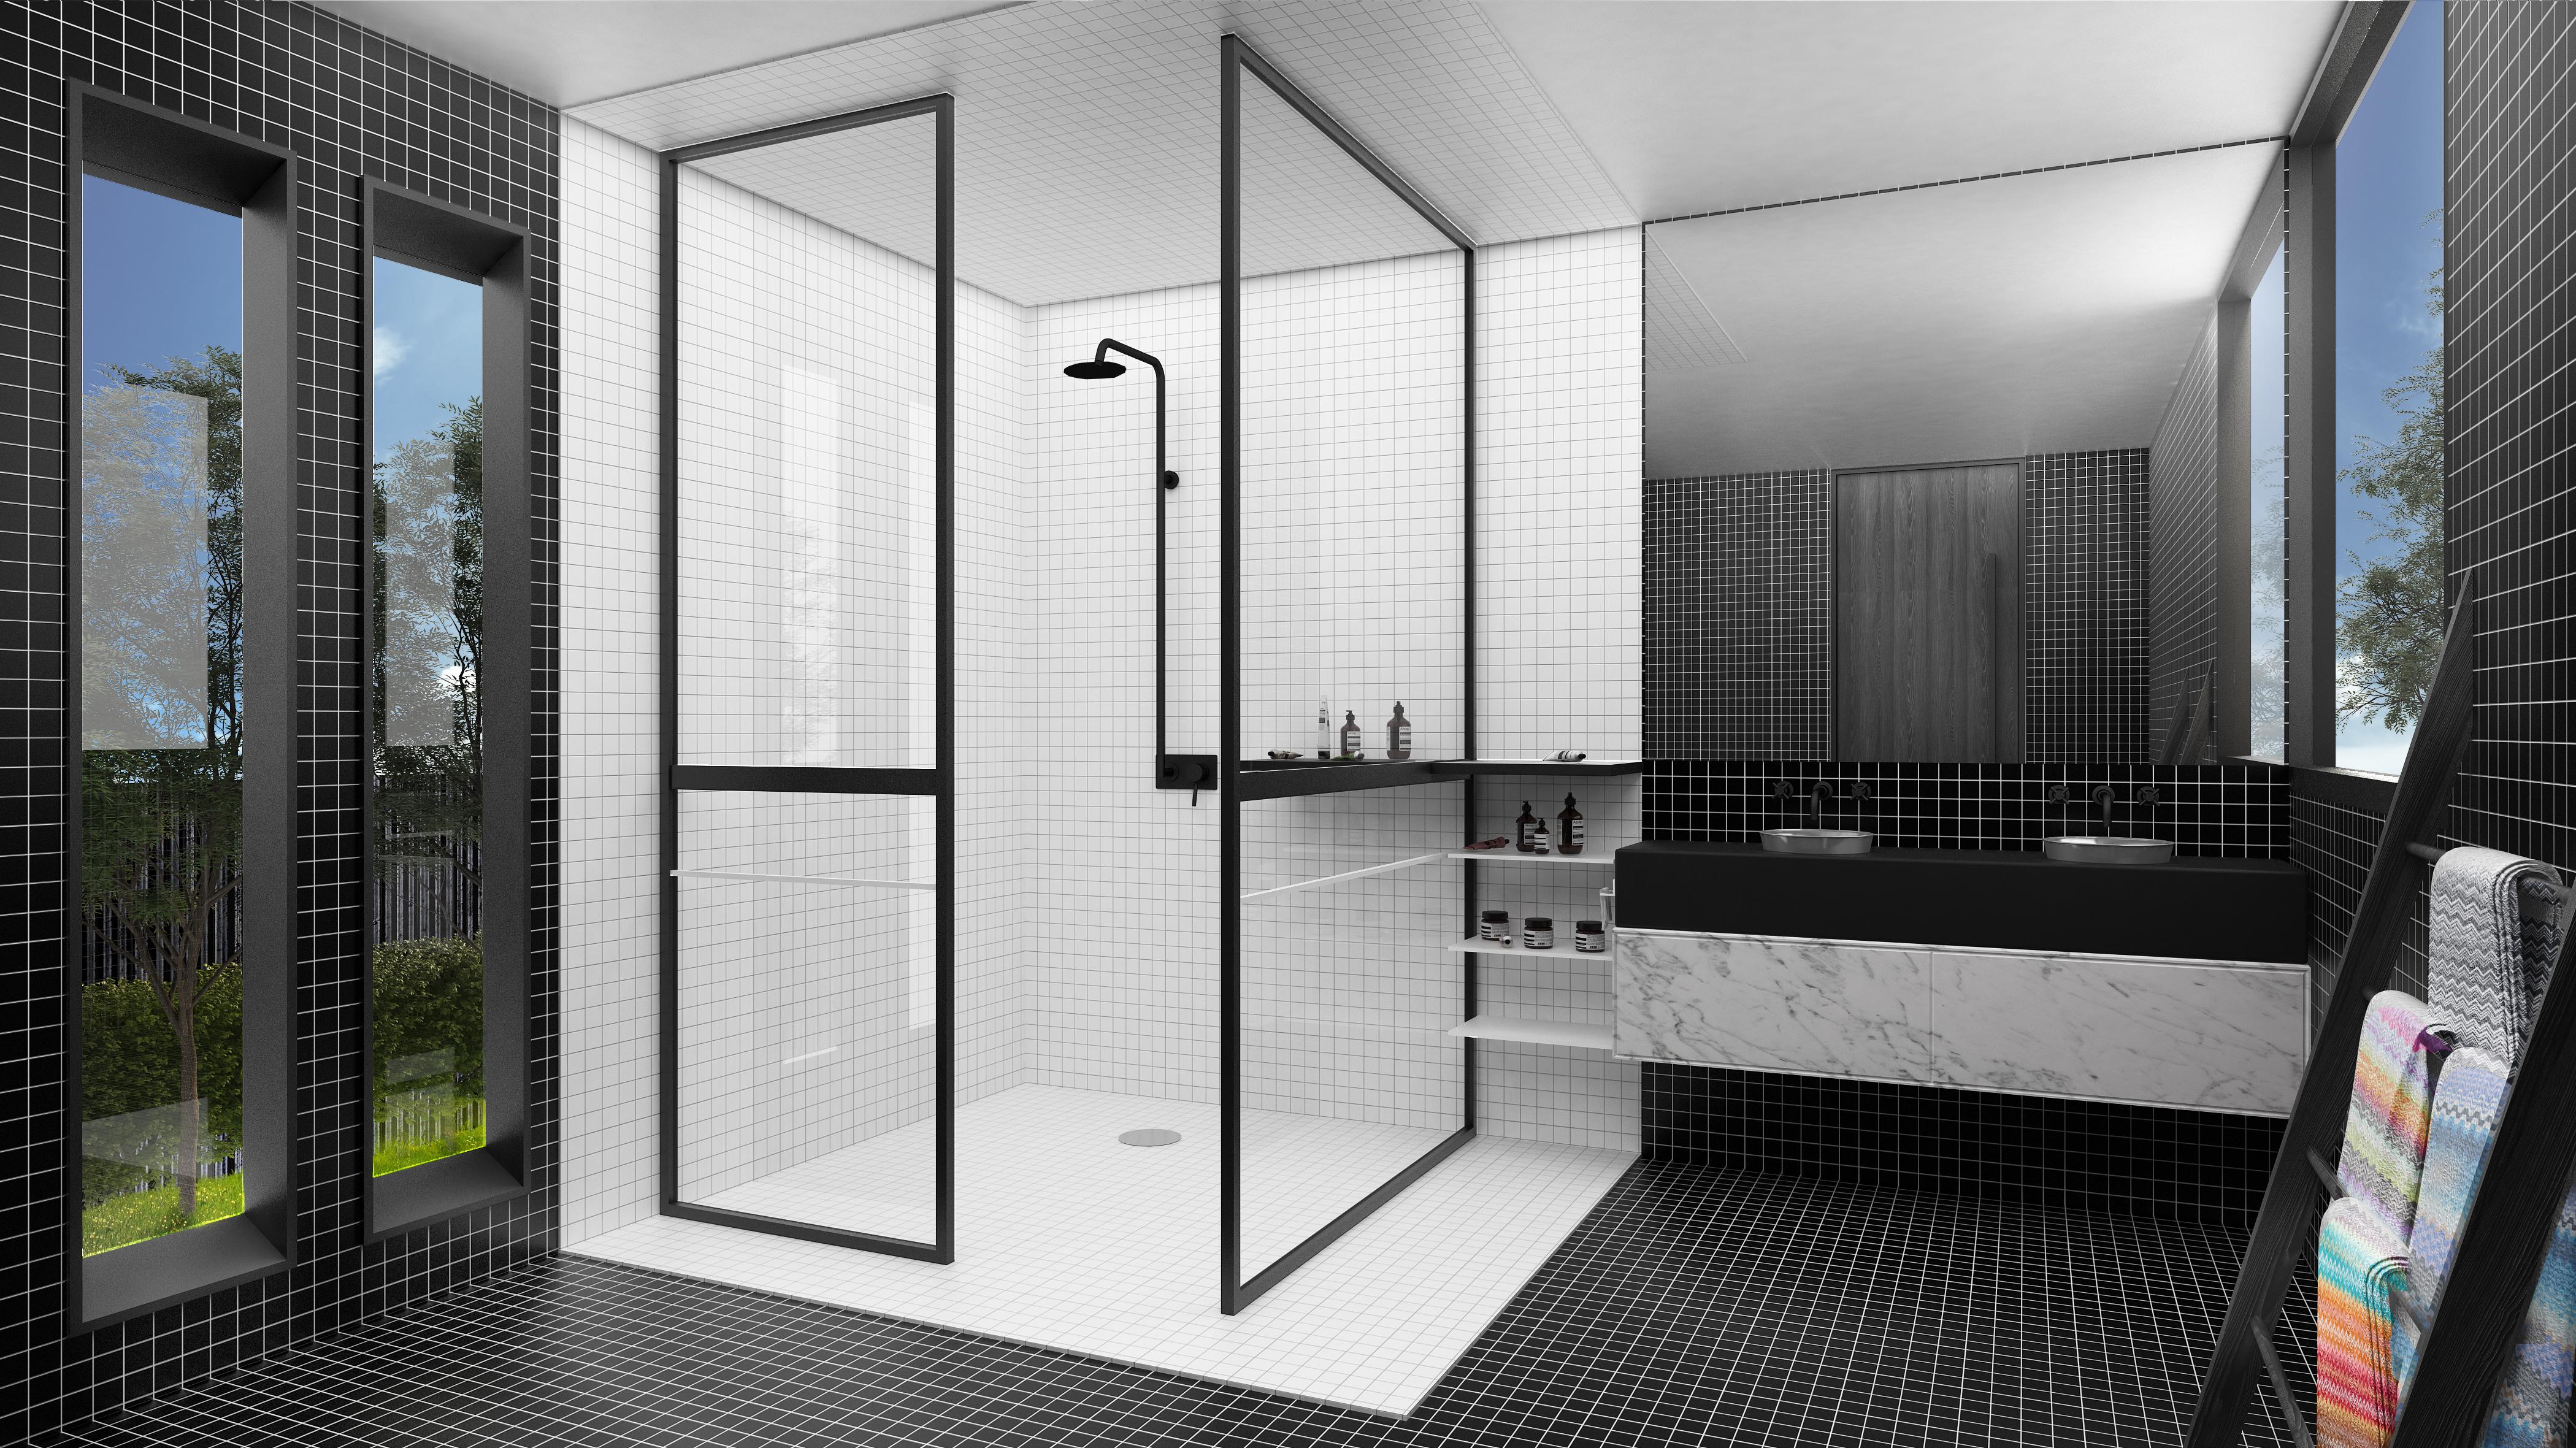 Steel Framed Showers - Steel Shower Screens Australia